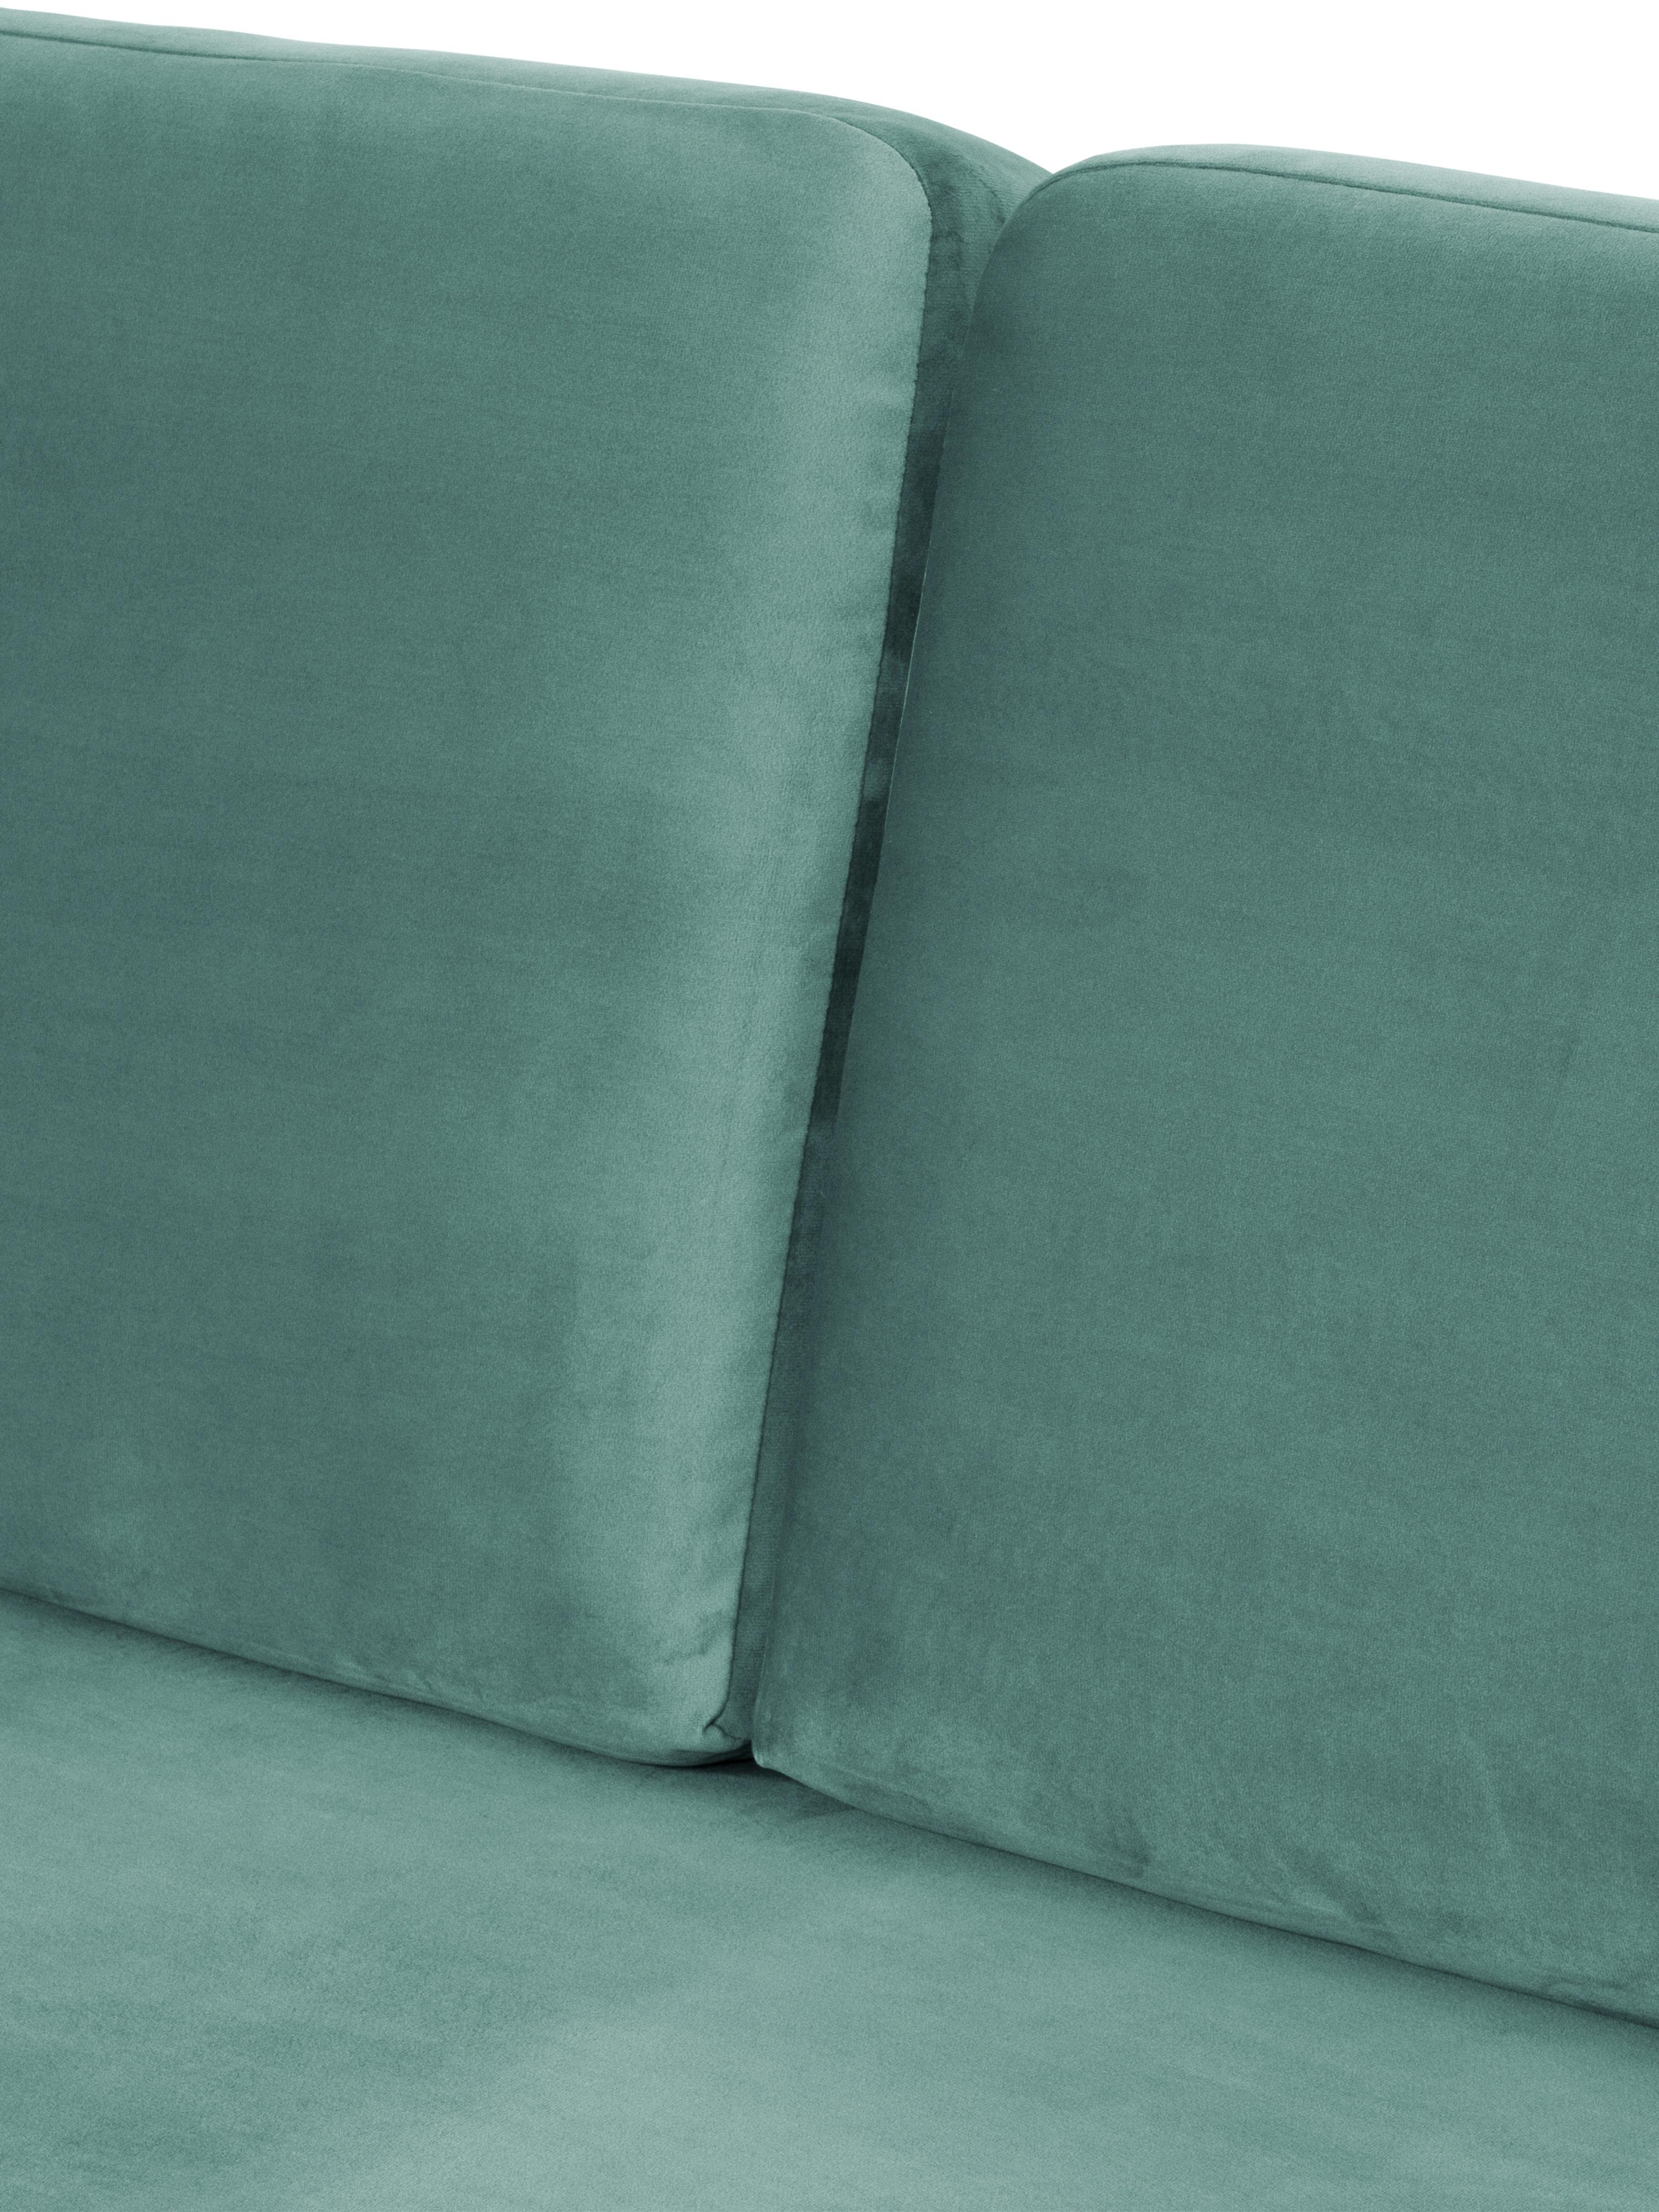 Samt-Ecksofa Fluente, Bezug: Samt (Hochwertiger Polyes, Gestell: Massives Kiefernholz, Füße: Metall, pulverbeschichtet, Samt Hellgrün, B 221 x T 200 cm